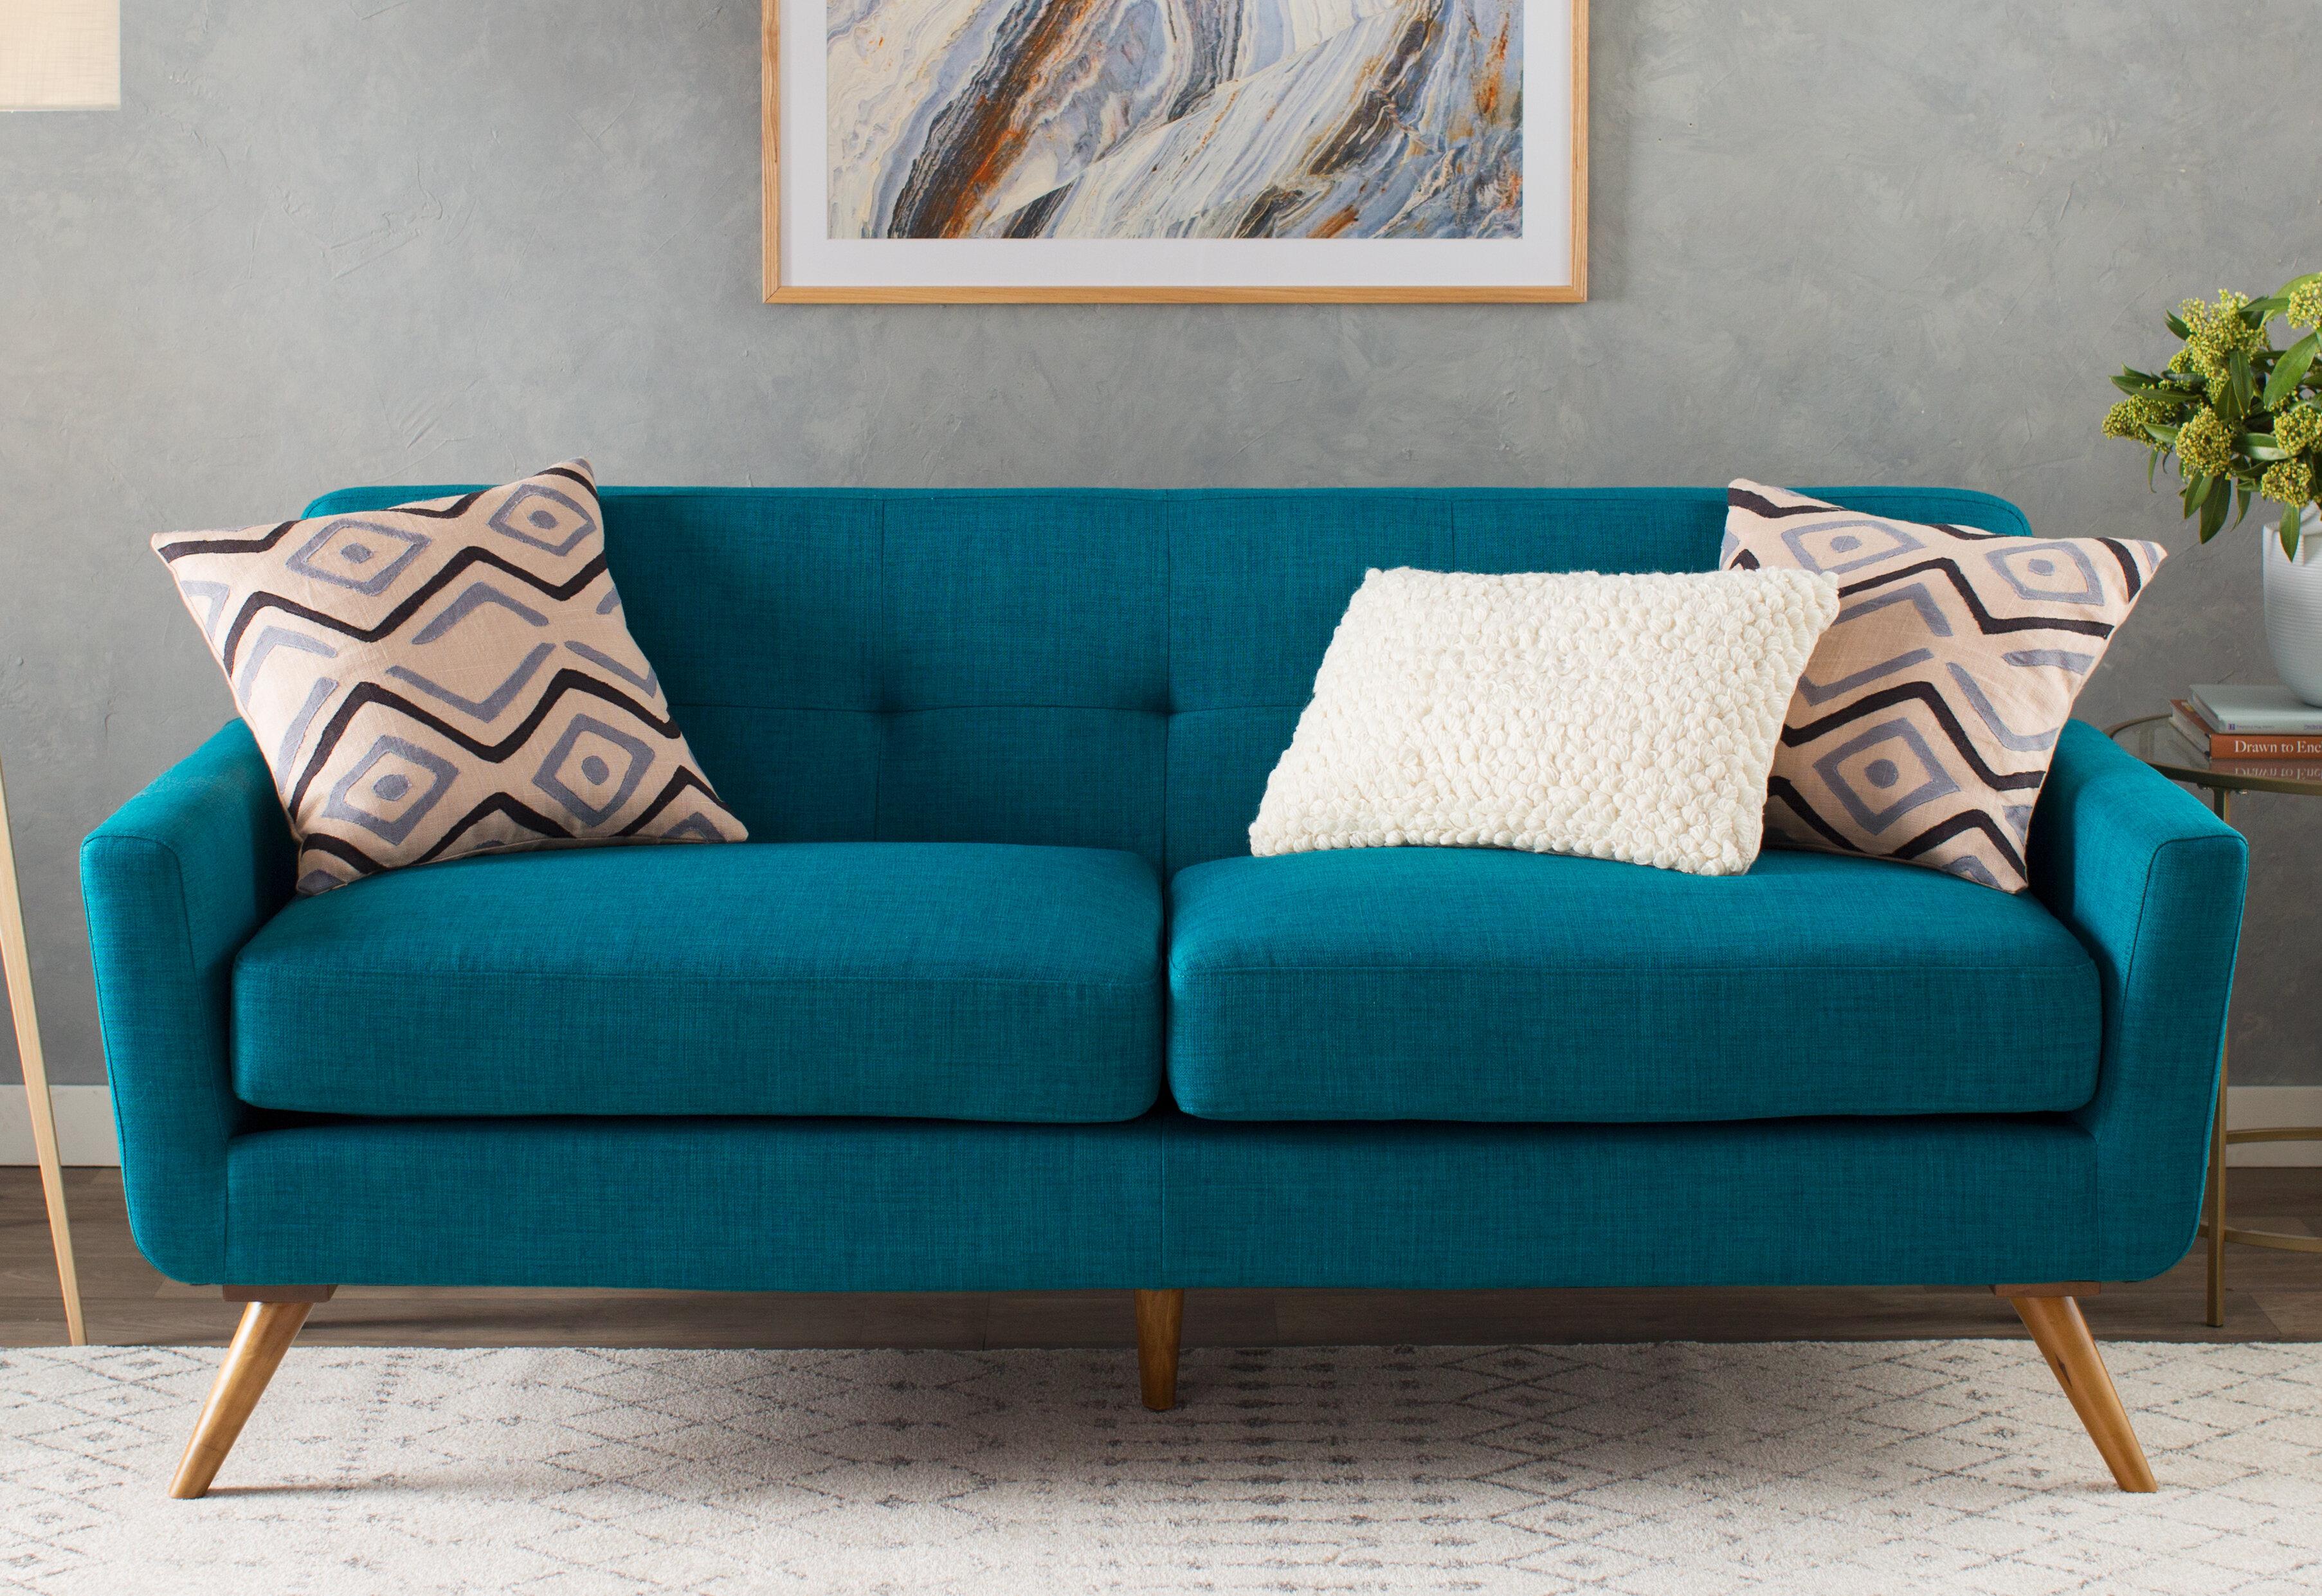 Fantastic Langley Street Fresco Tufted Sofa & Reviews | Wayfair JN46